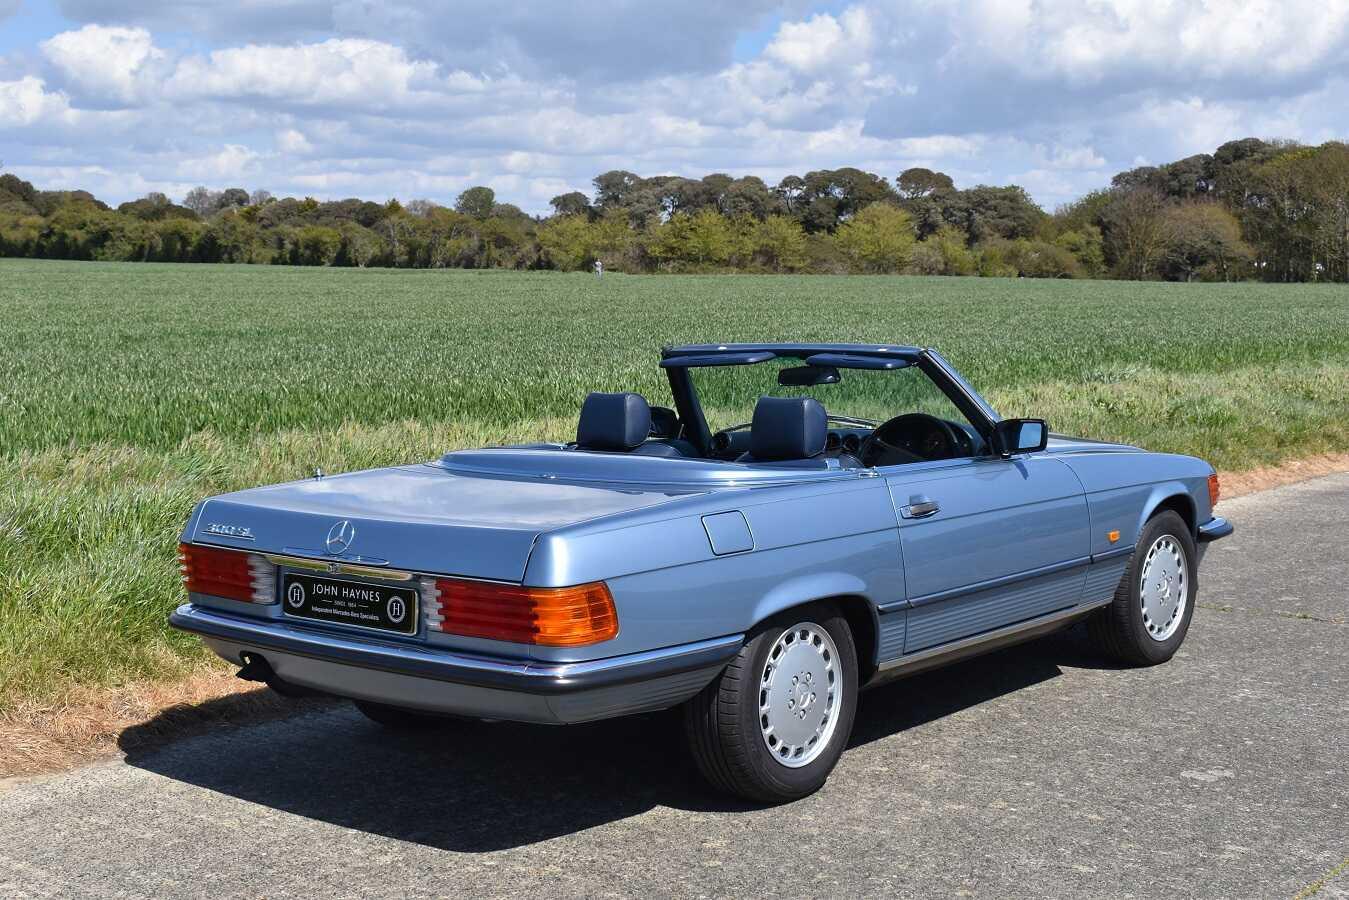 1989 Mercedes-Benz 300sl in Diamond Blue Metallic